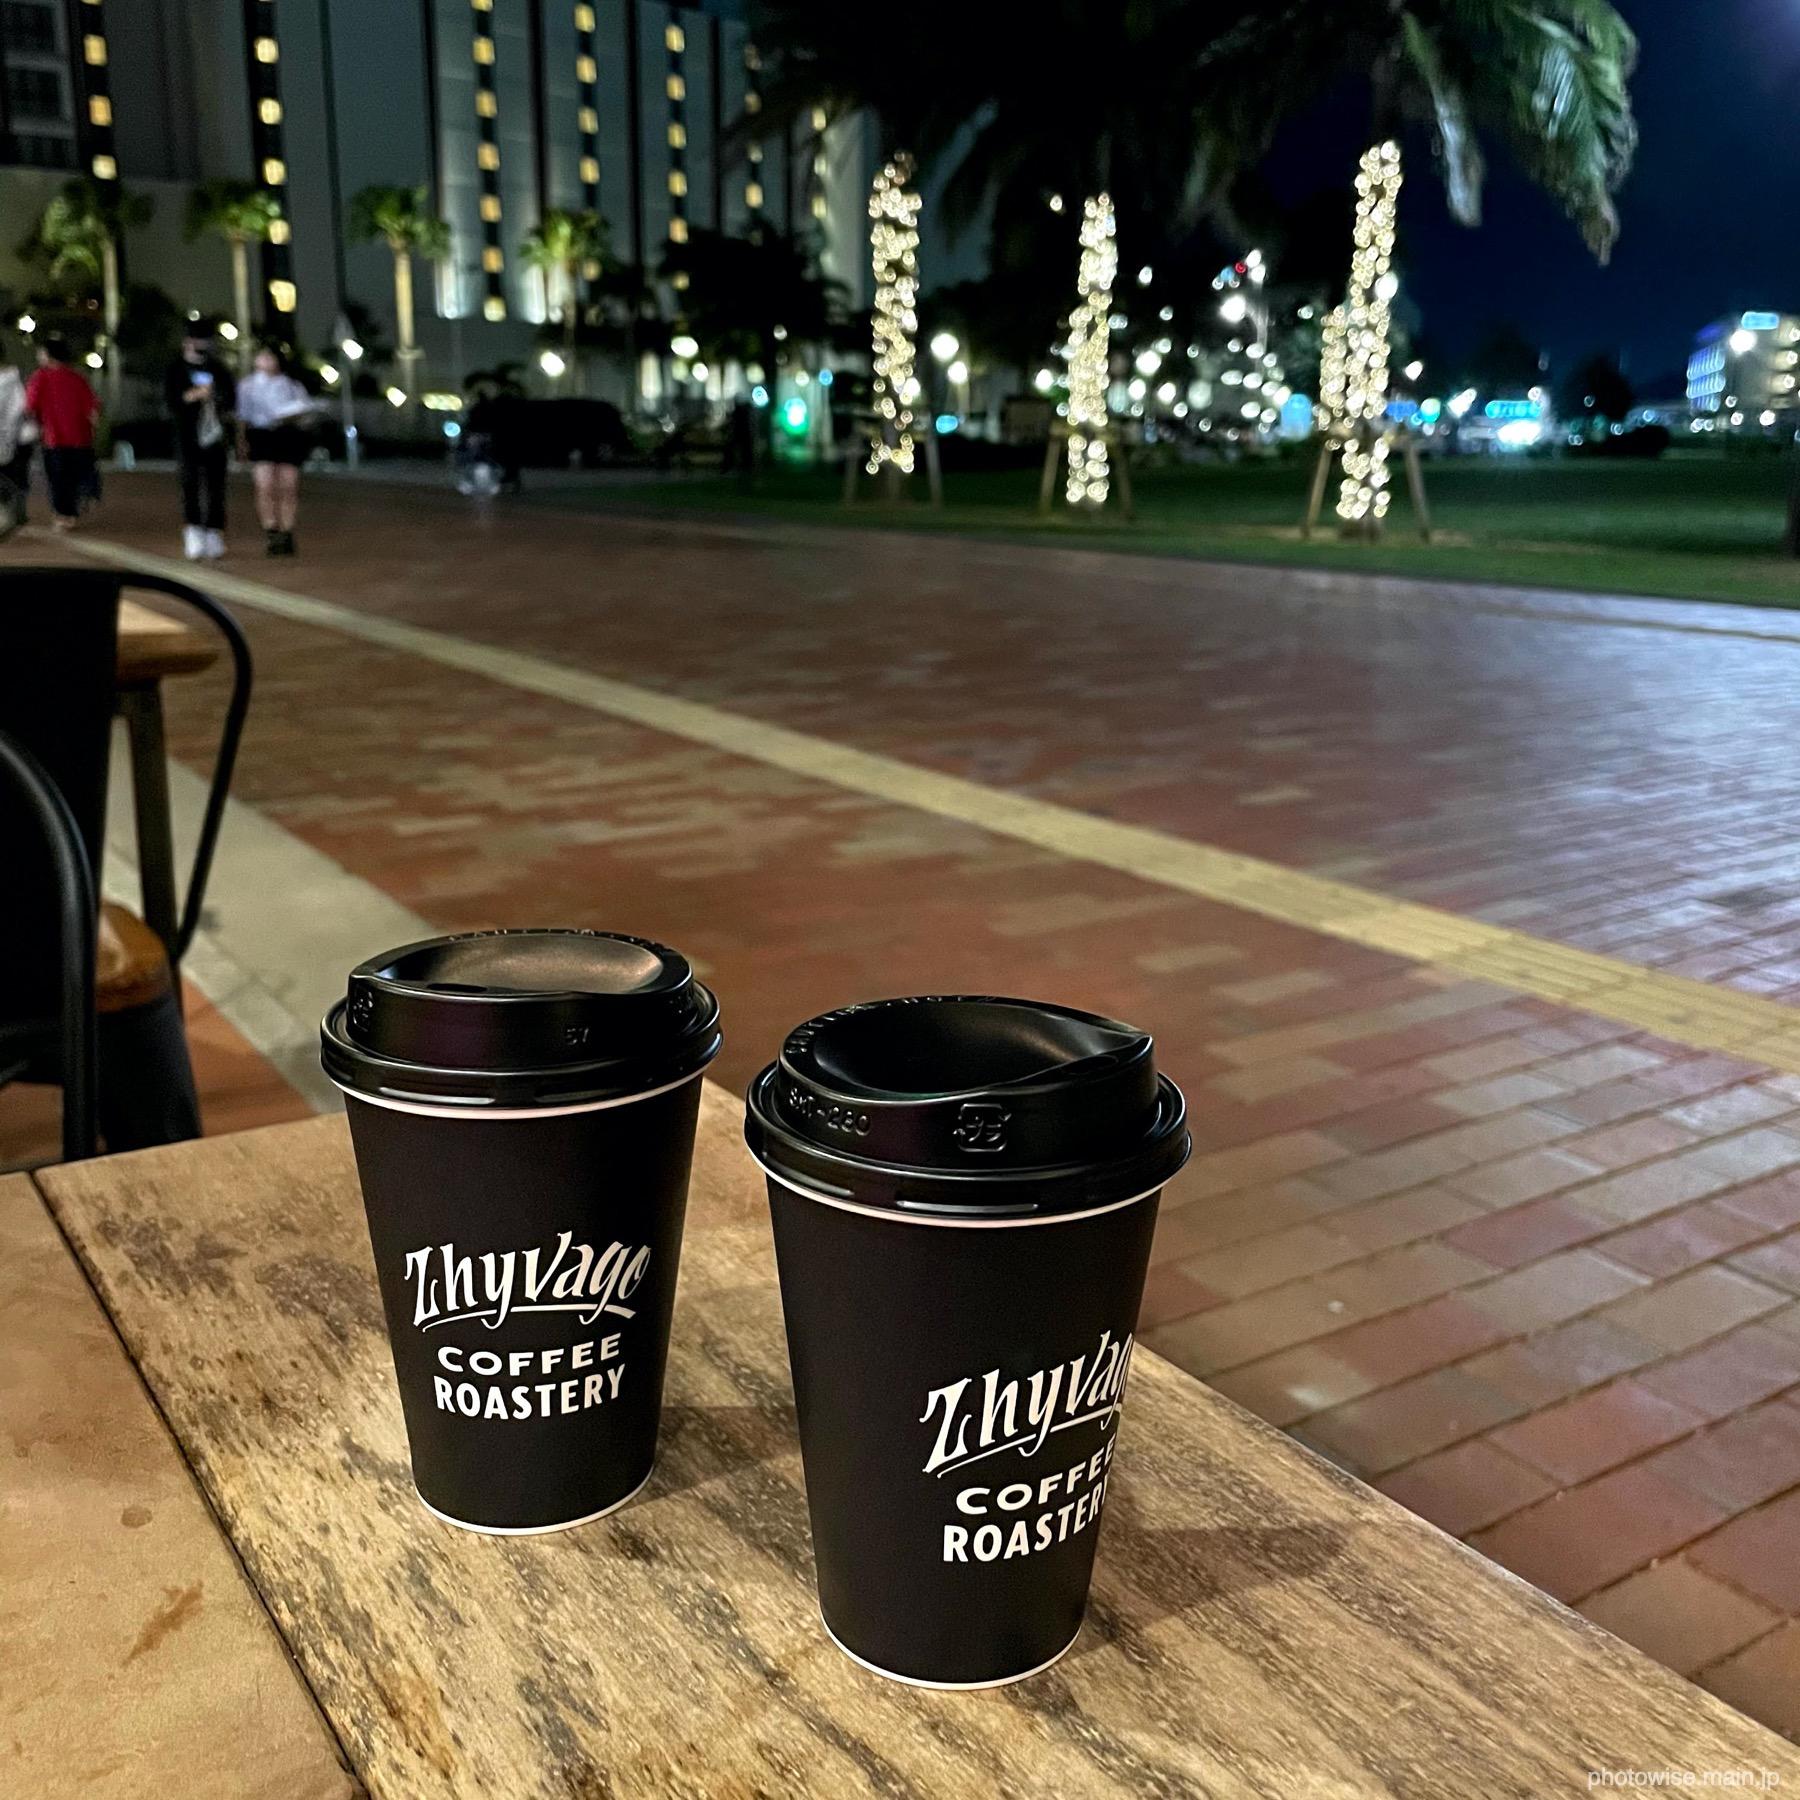 ZHYVAGO COFFEE ROASTERY